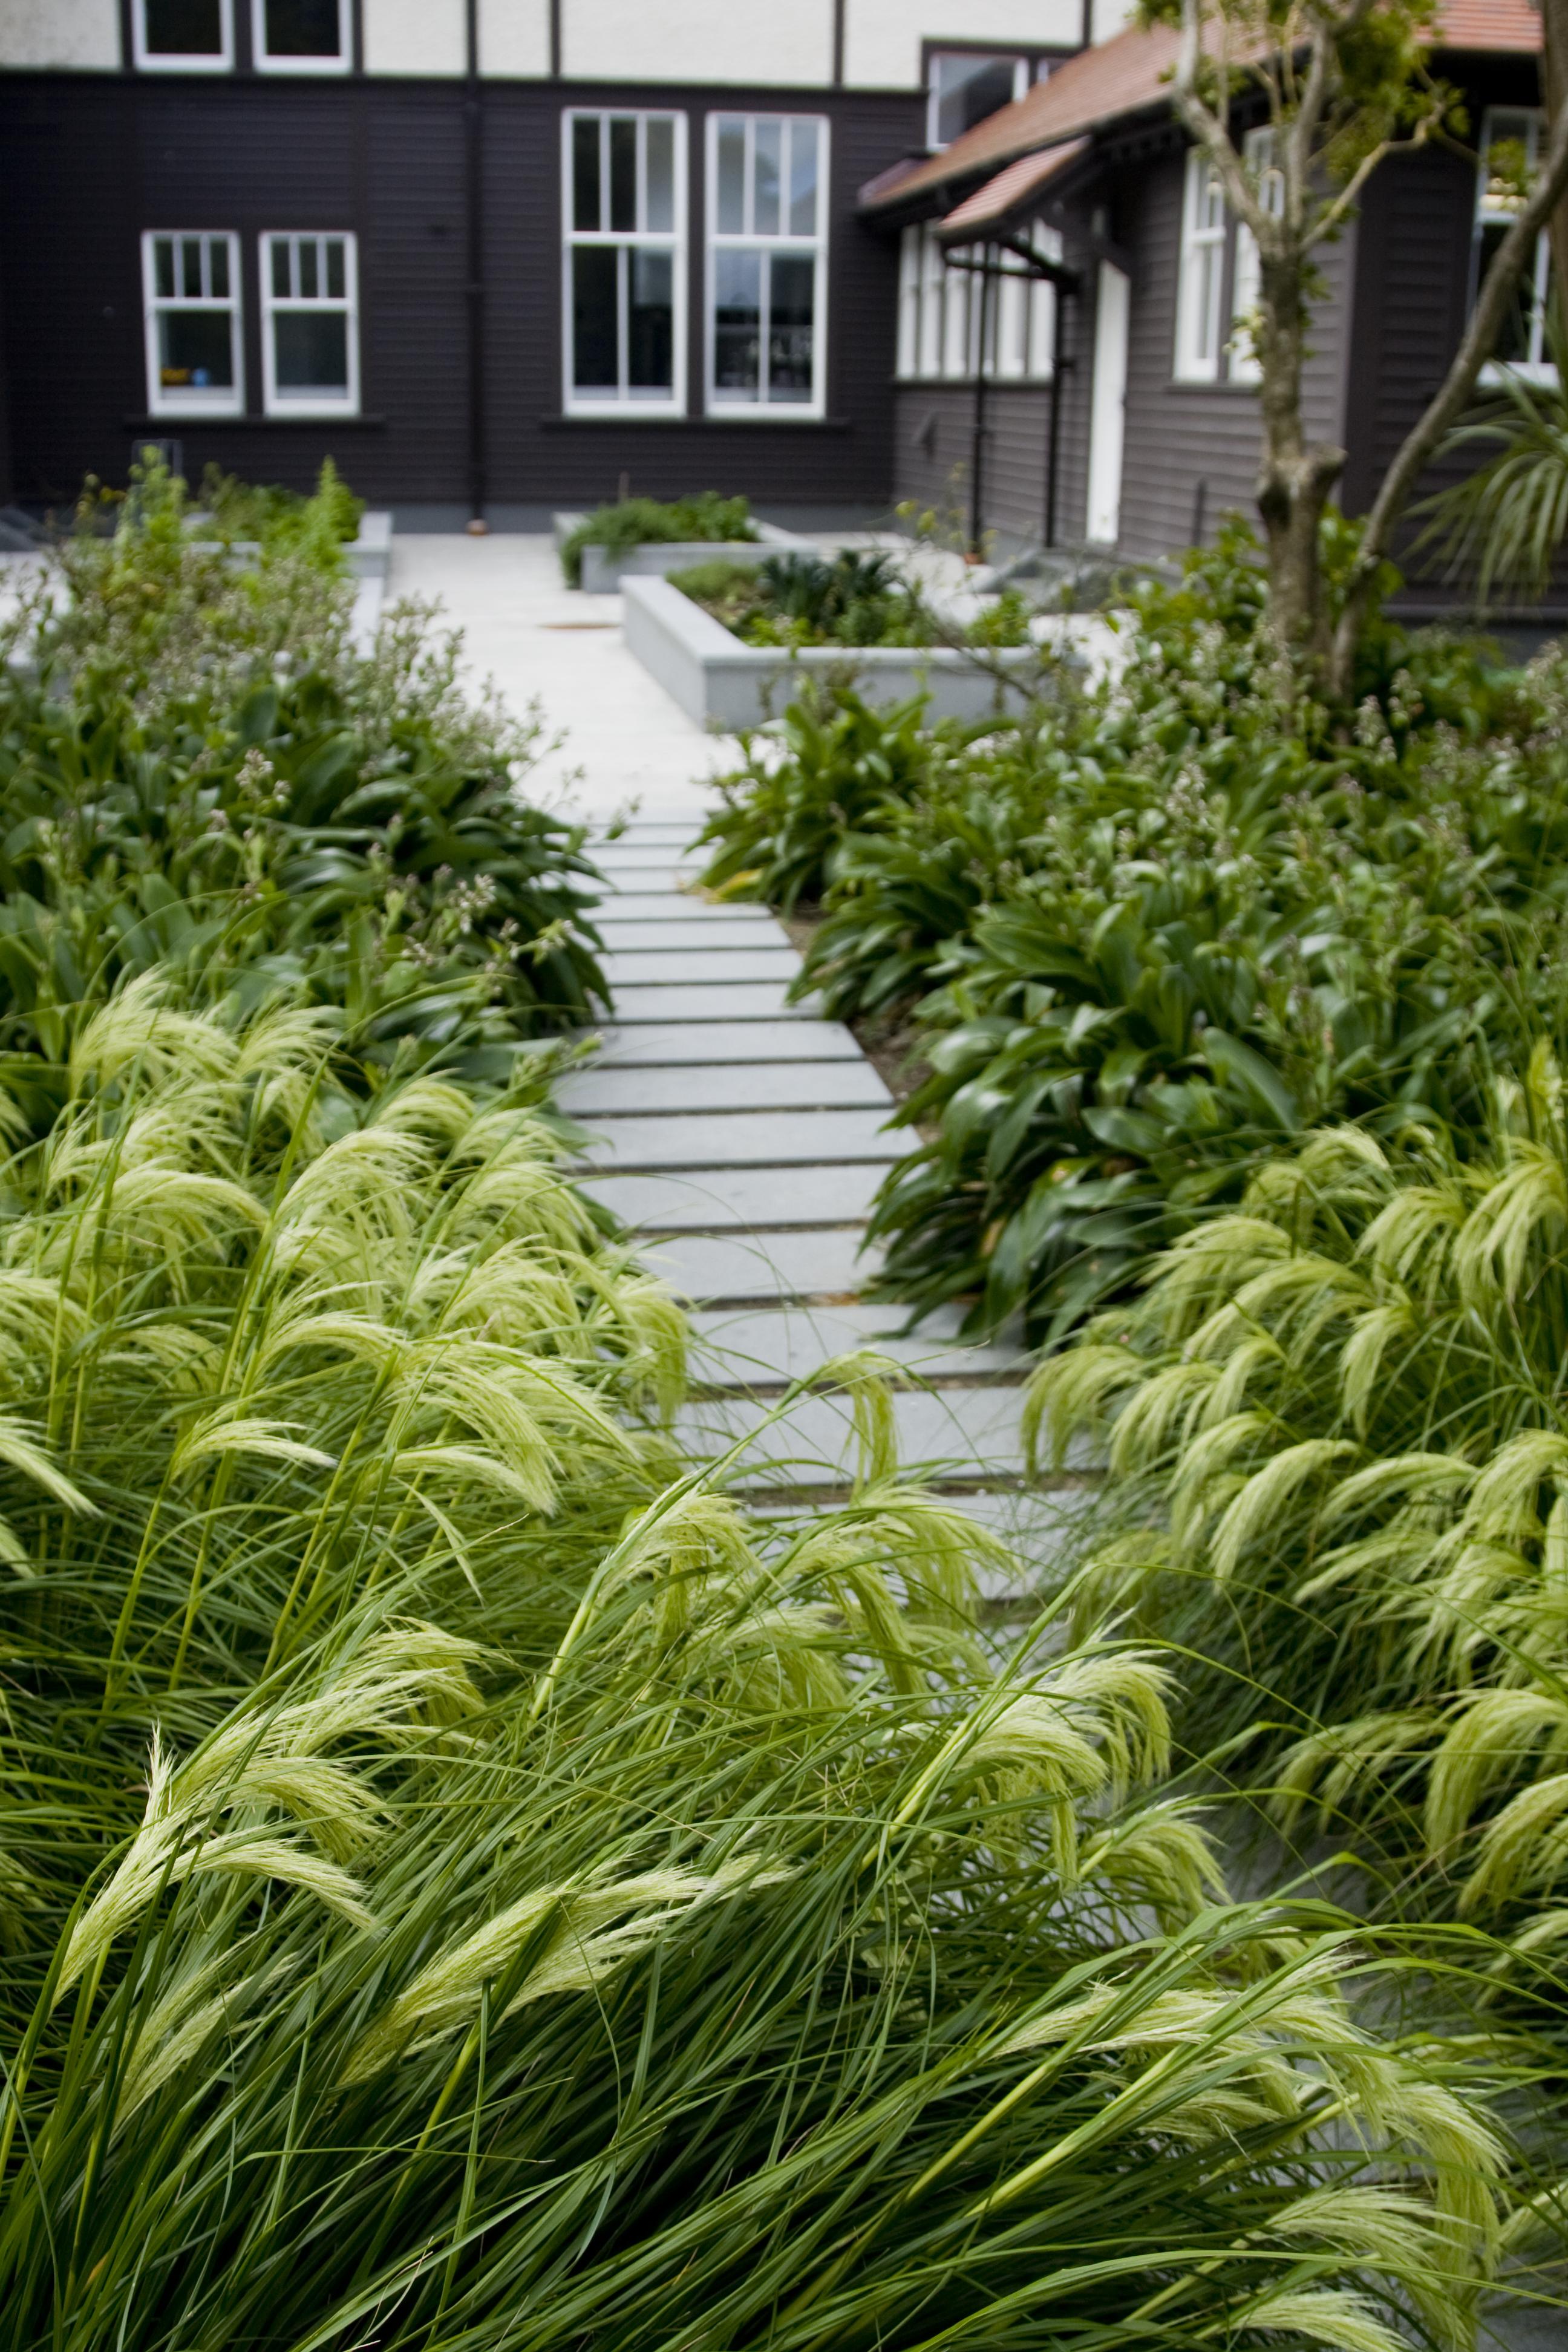 Garden design images nz for Landscape design jobs new zealand